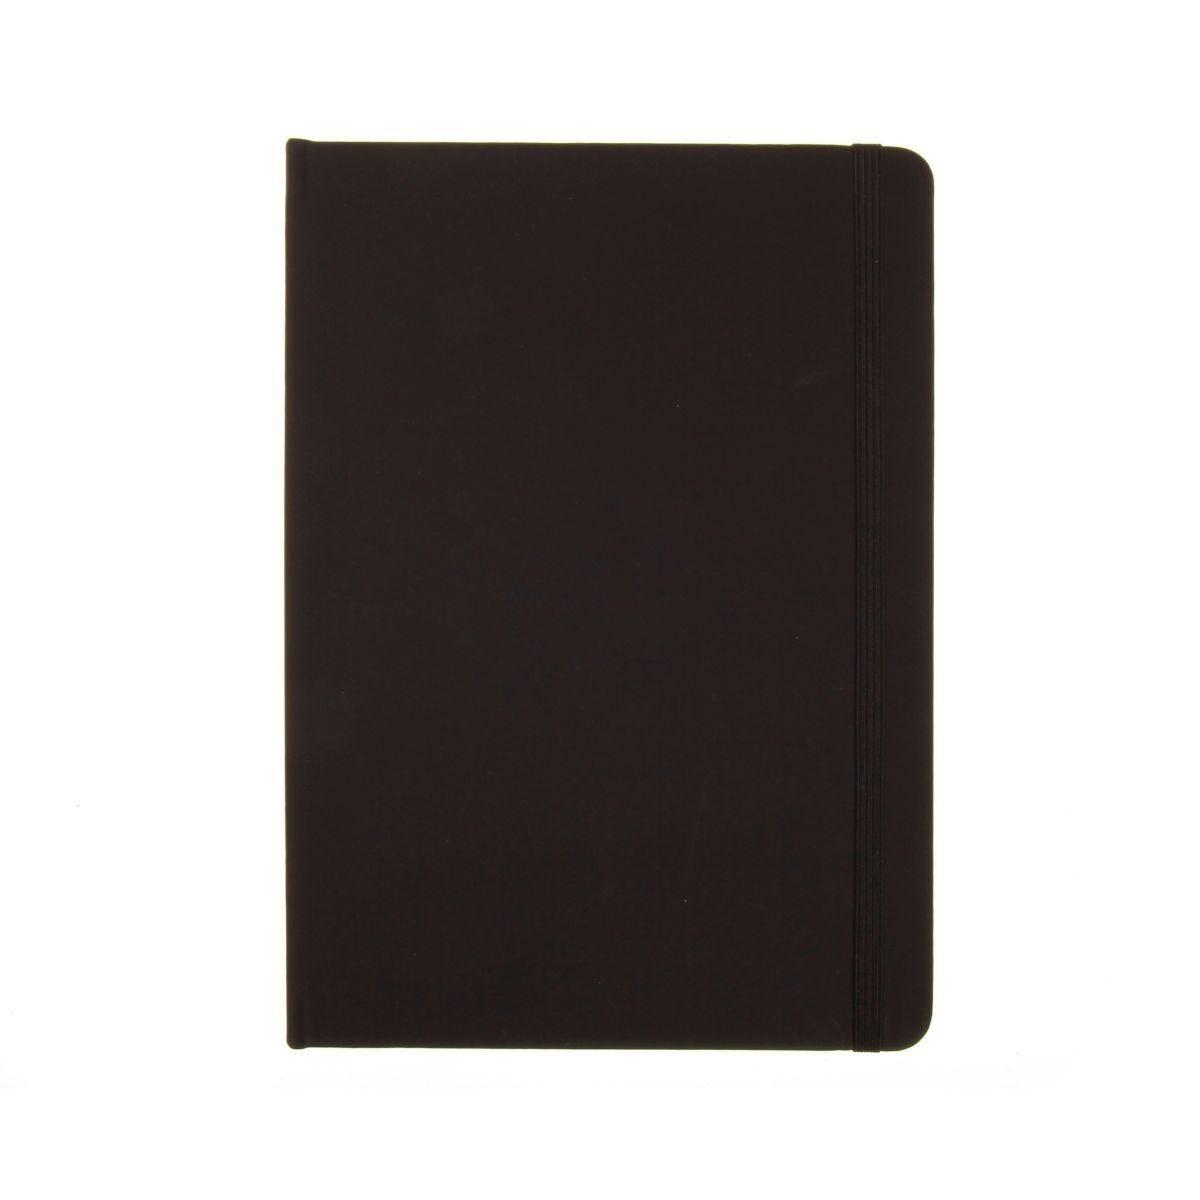 Pukka Soft Cover Notebook A5 Medium